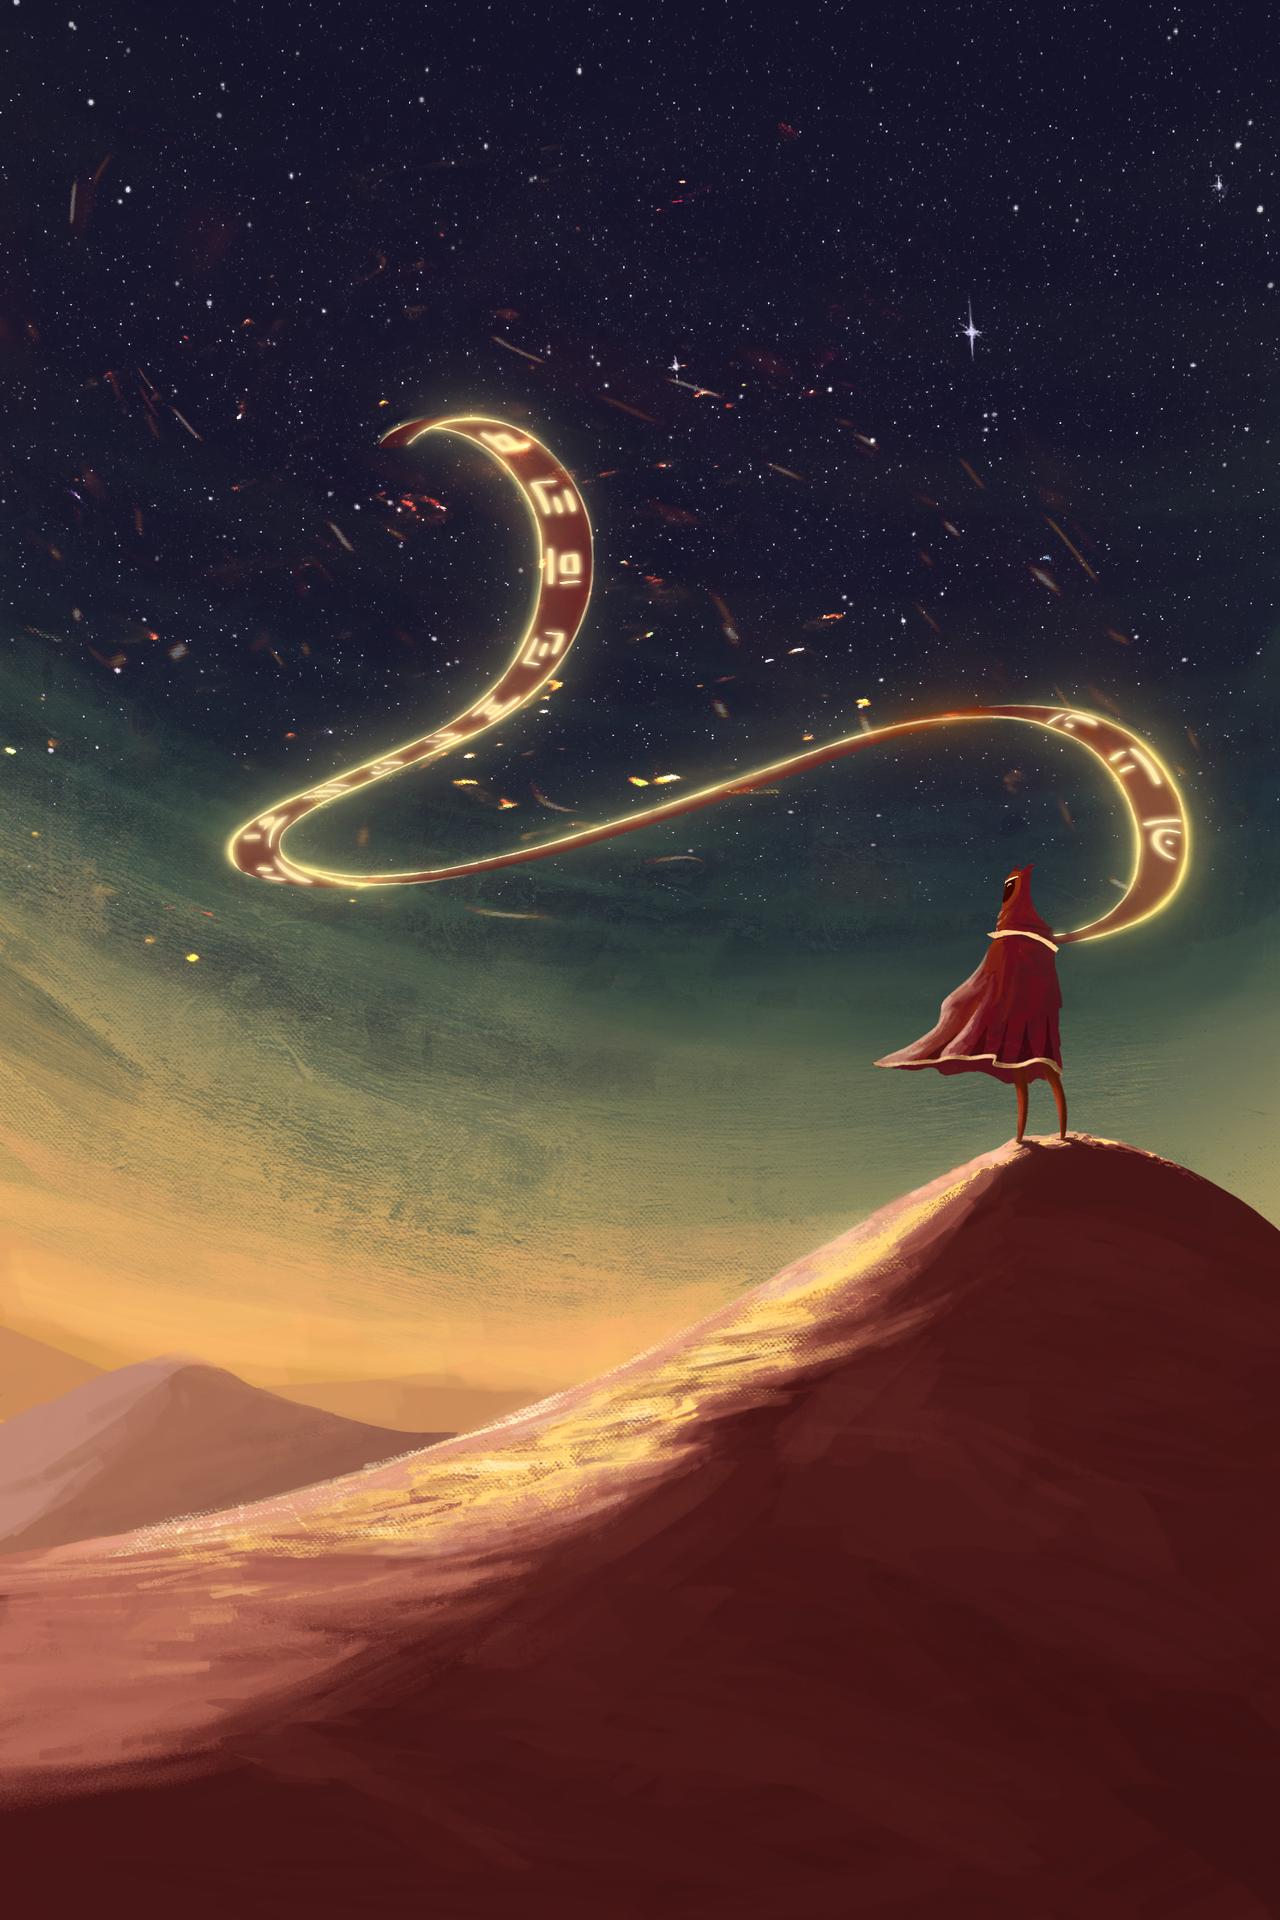 Journey by Seven-Bit